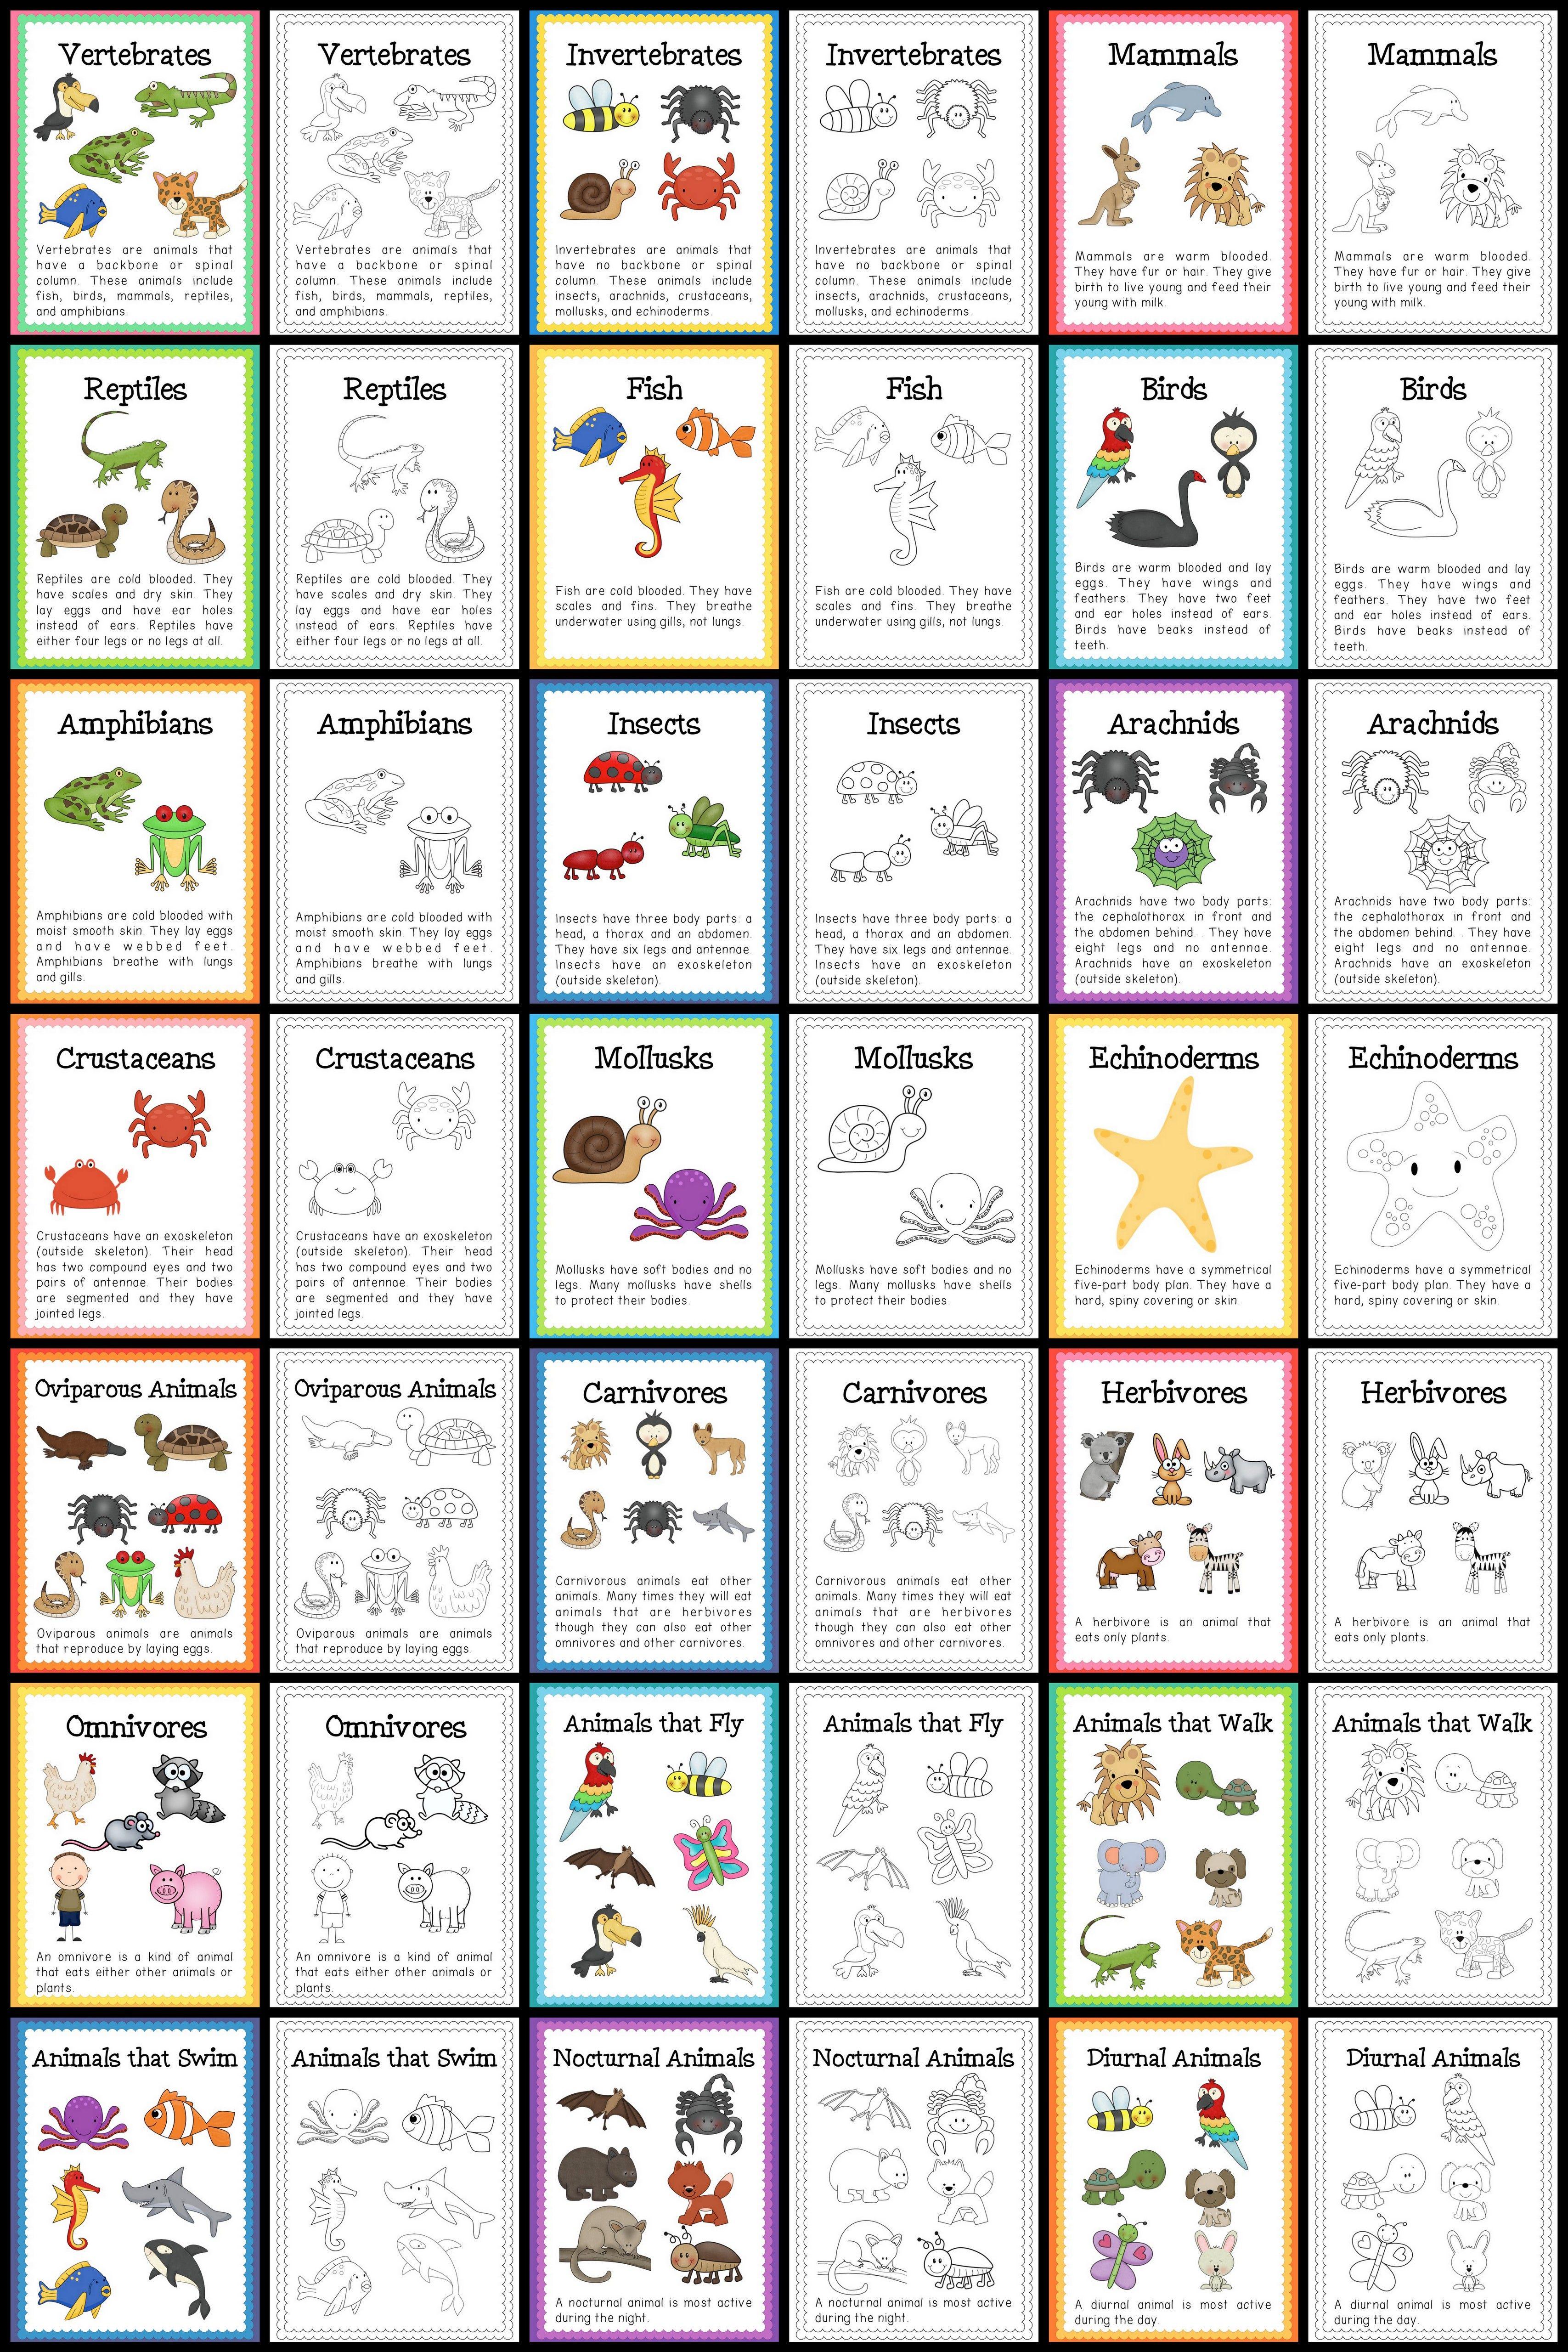 Animal Classification Life Cycles Animal